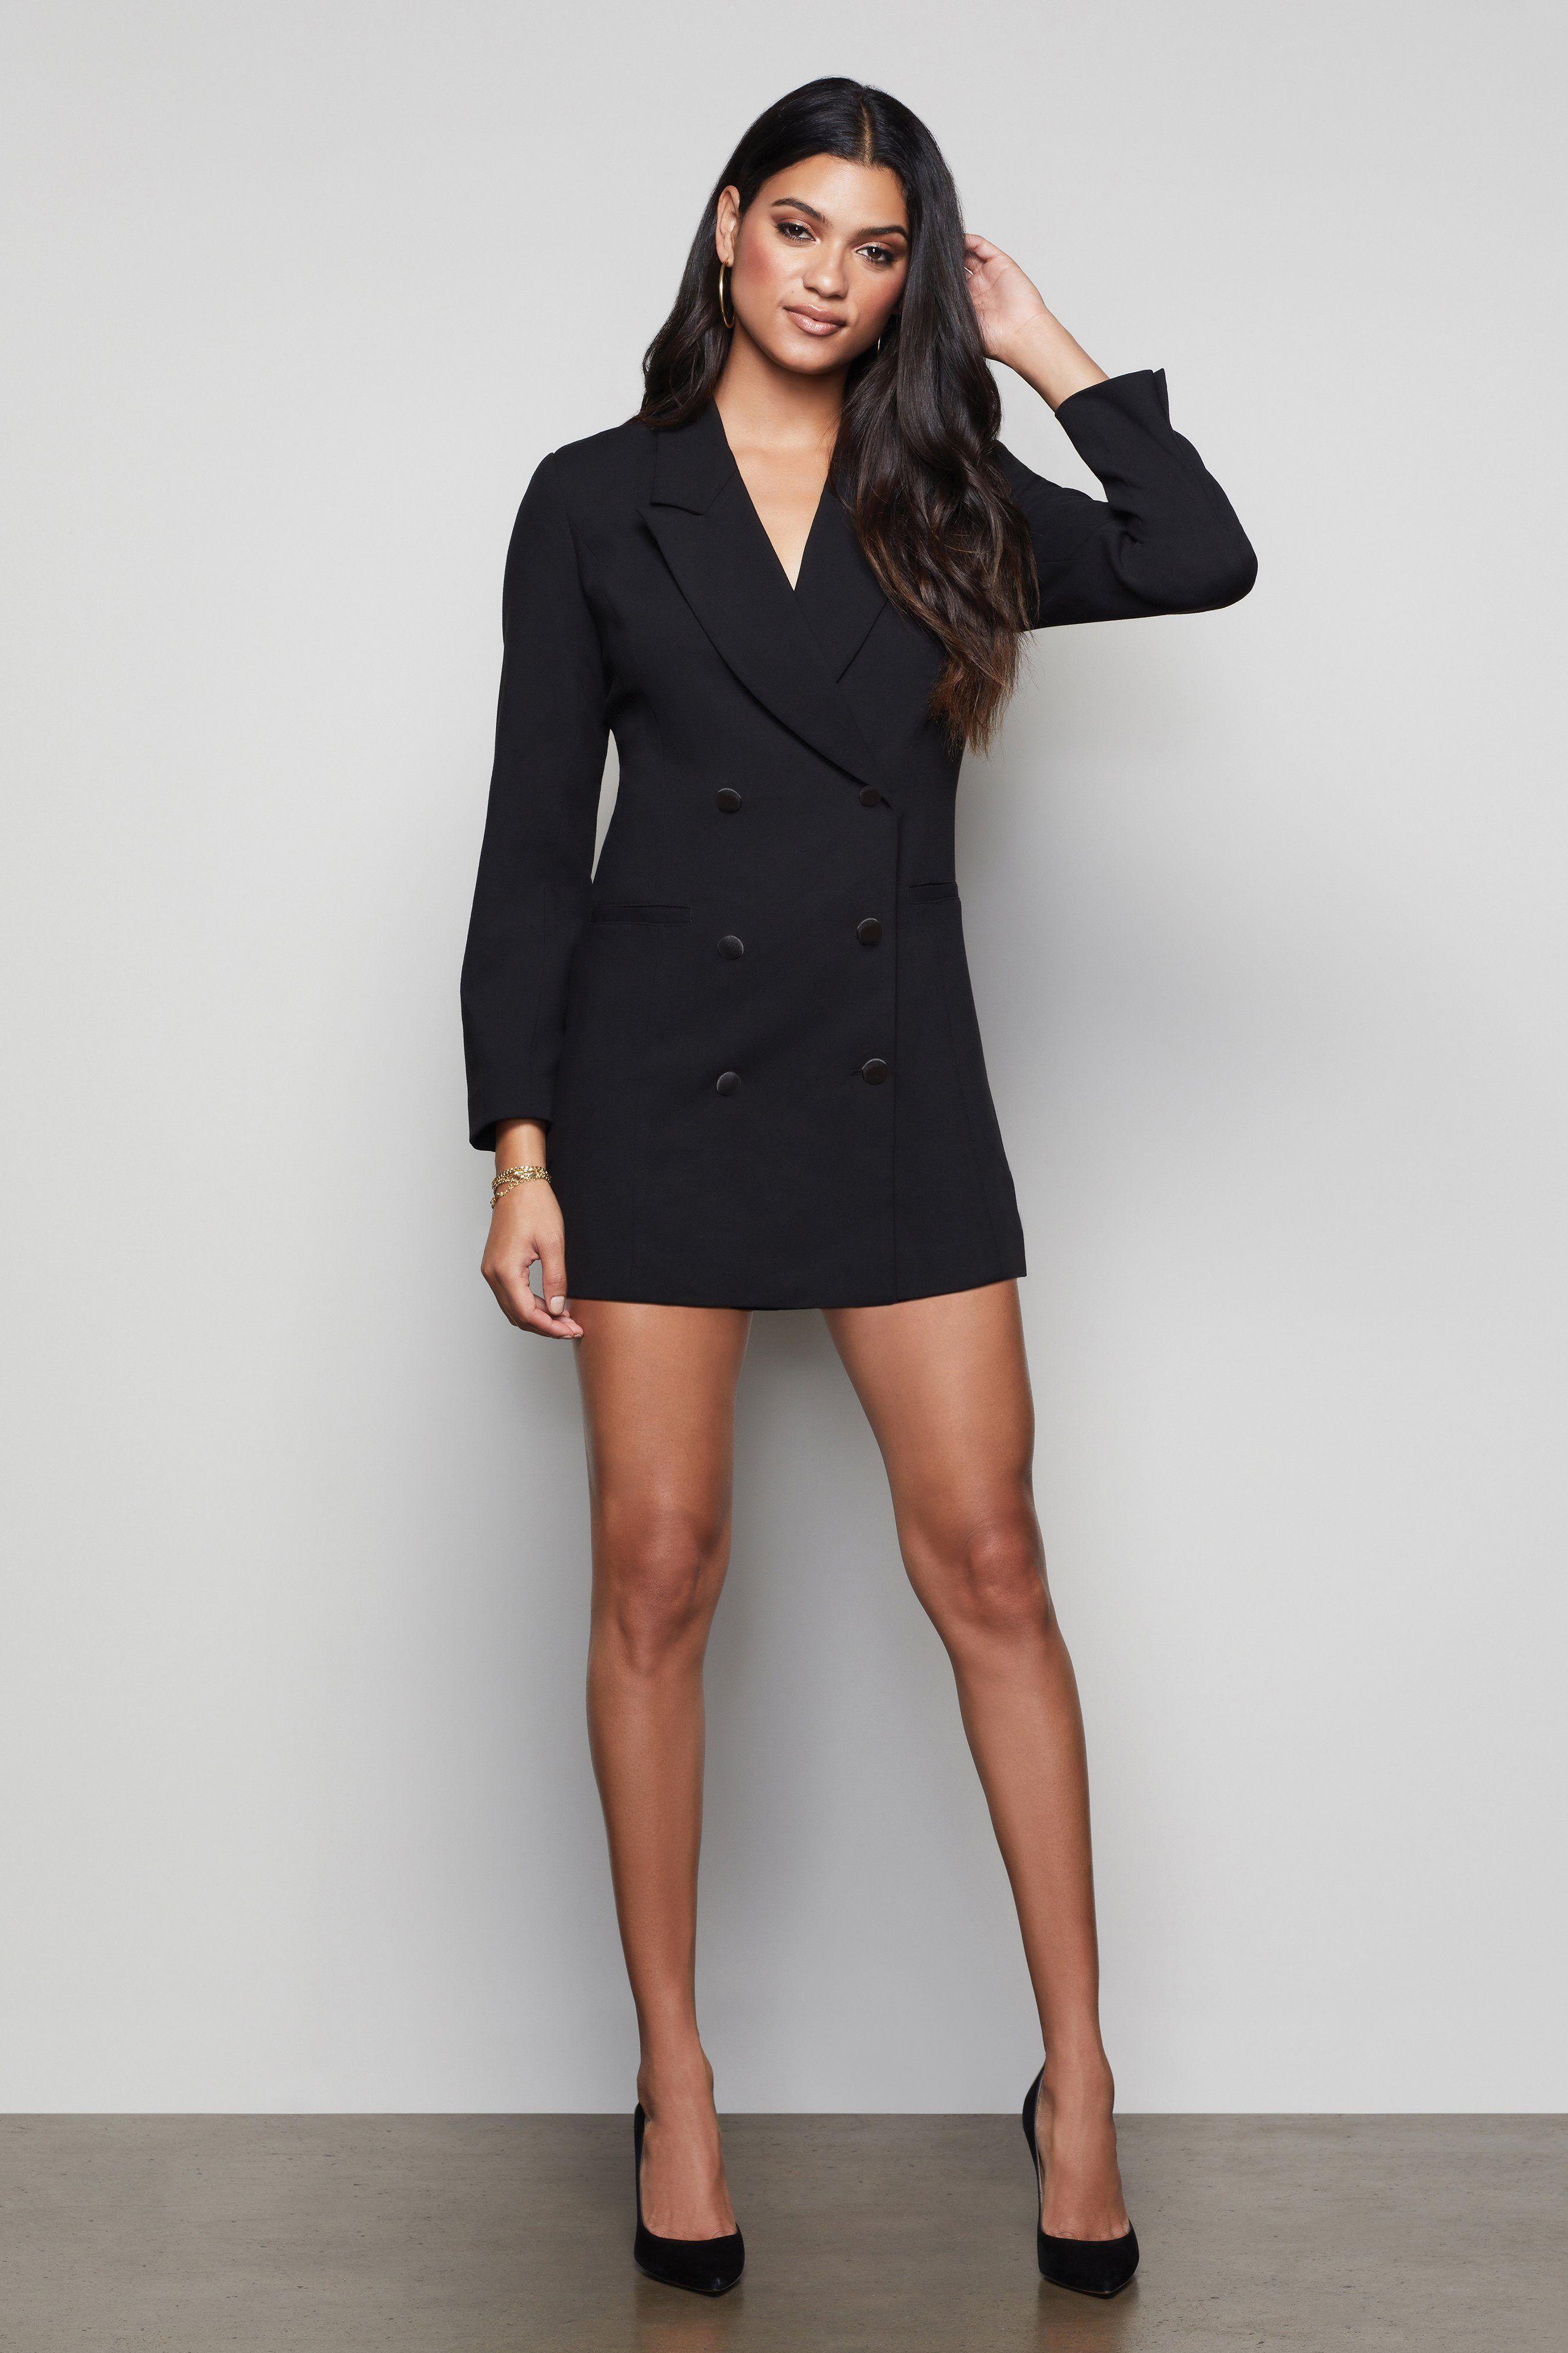 The Exec Blazer Dress Black001 Blazer Dress Black Dress Accessories Black Dresses Classy [ 4001 x 2667 Pixel ]